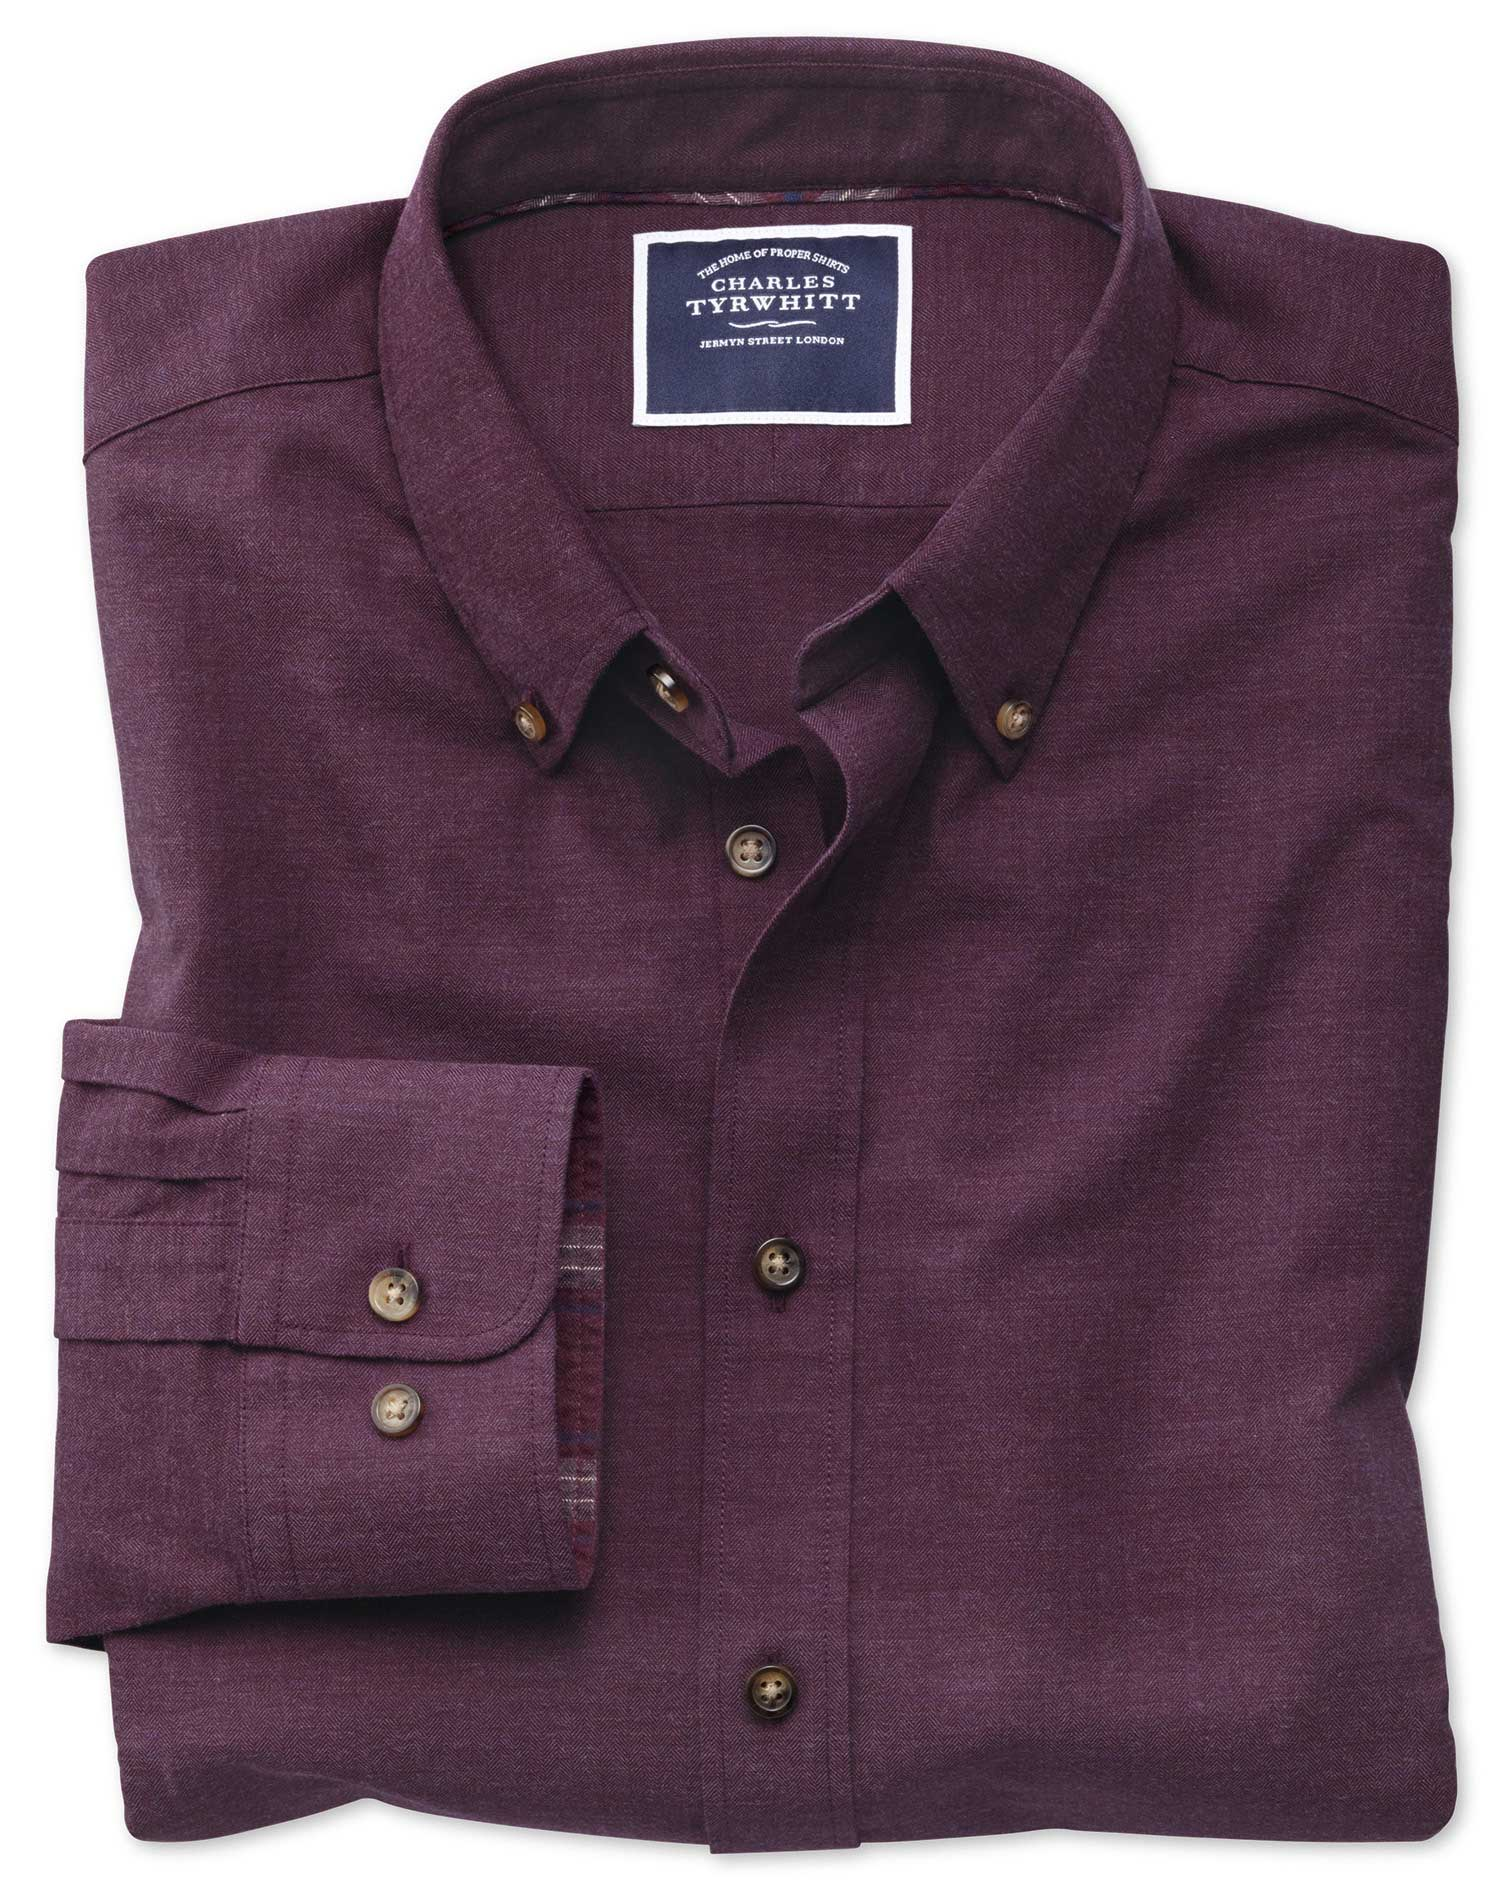 Extra Slim Fit Berry Herringbone Melange Cotton Shirt Single Cuff Size XXL by Charles Tyrwhitt